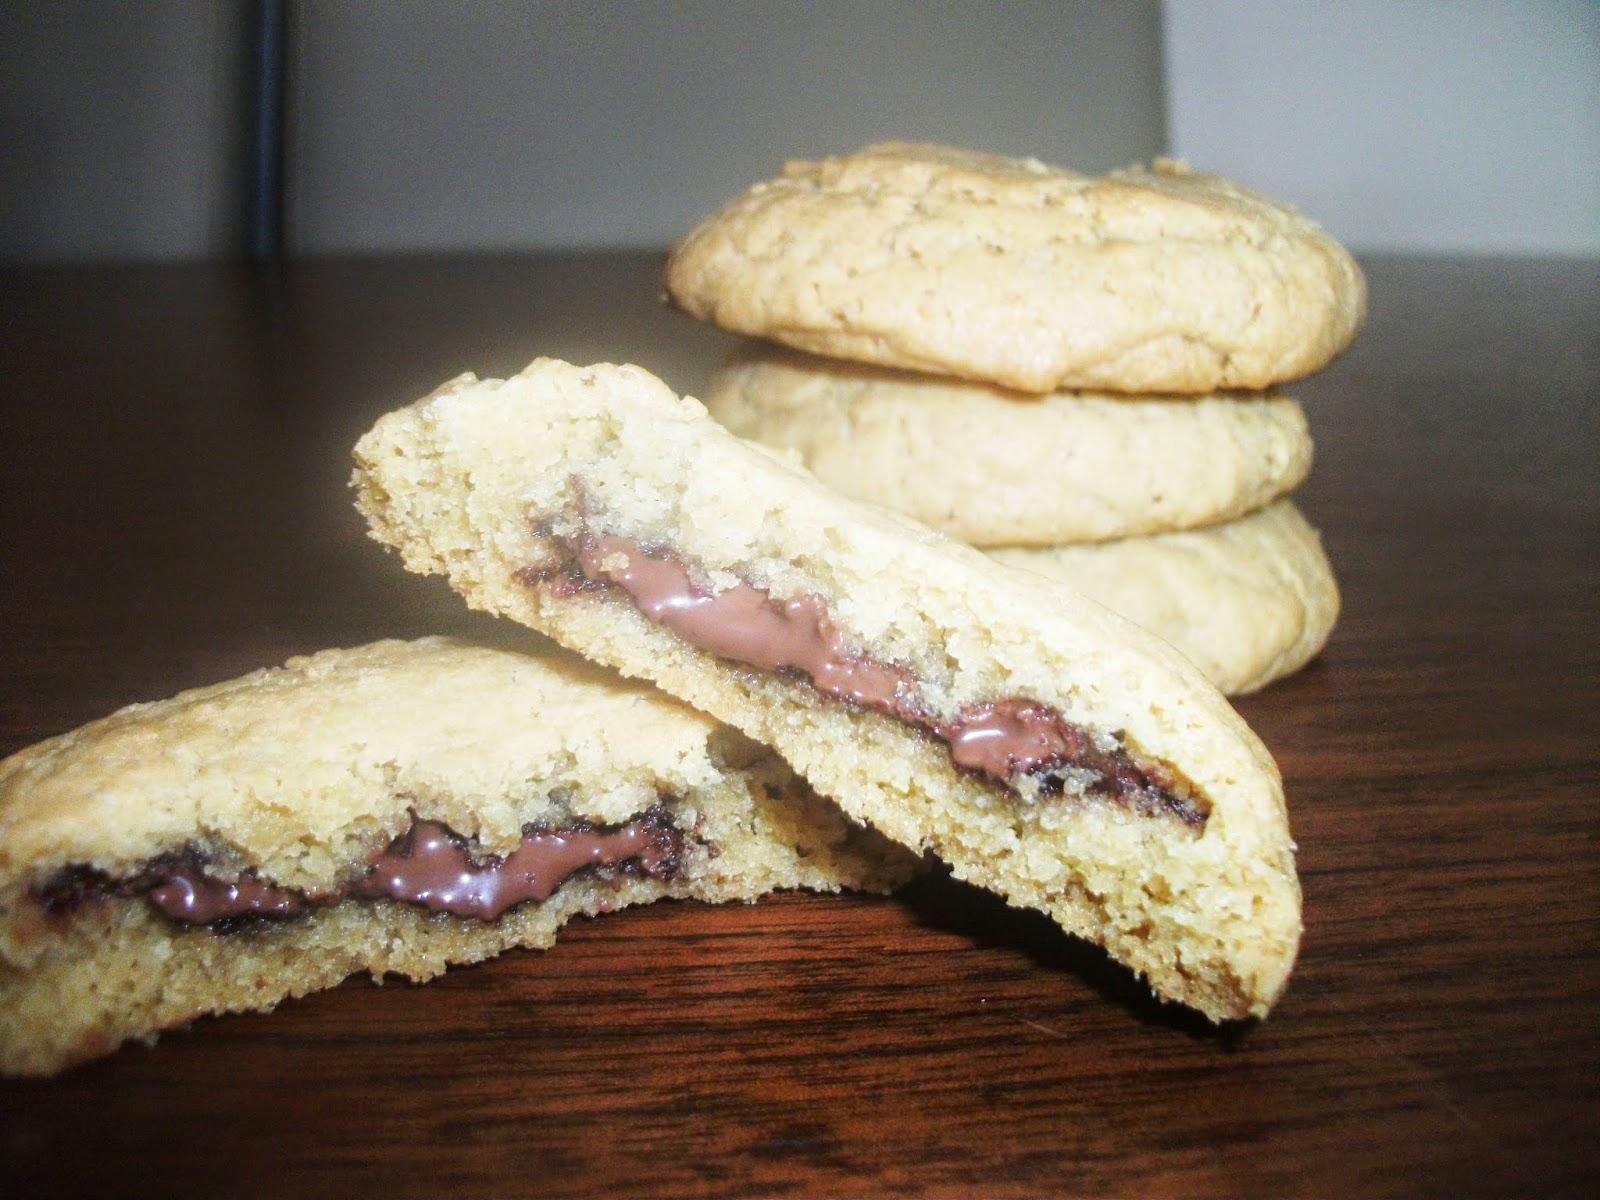 Gluten Free Nutella stuffed Peanut Butter Cookies